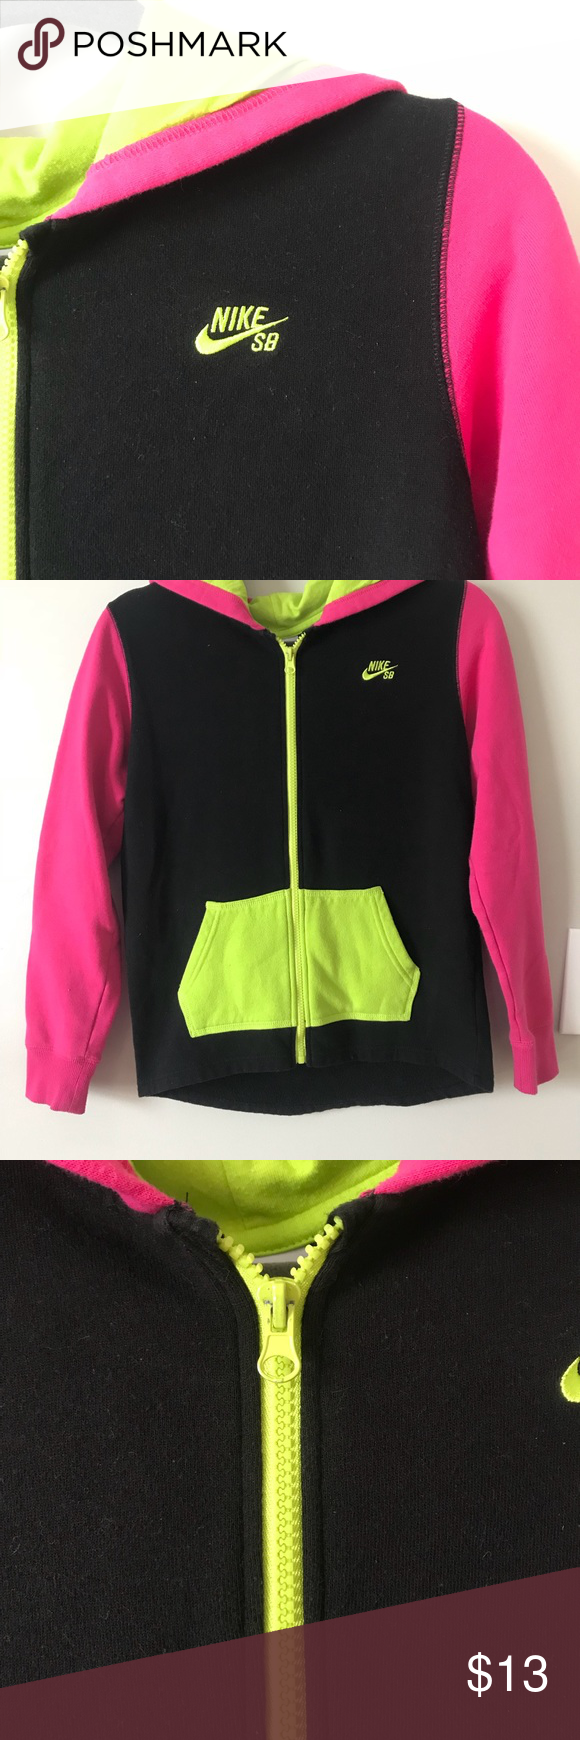 Nike SB zip up black, neon pink and neon green